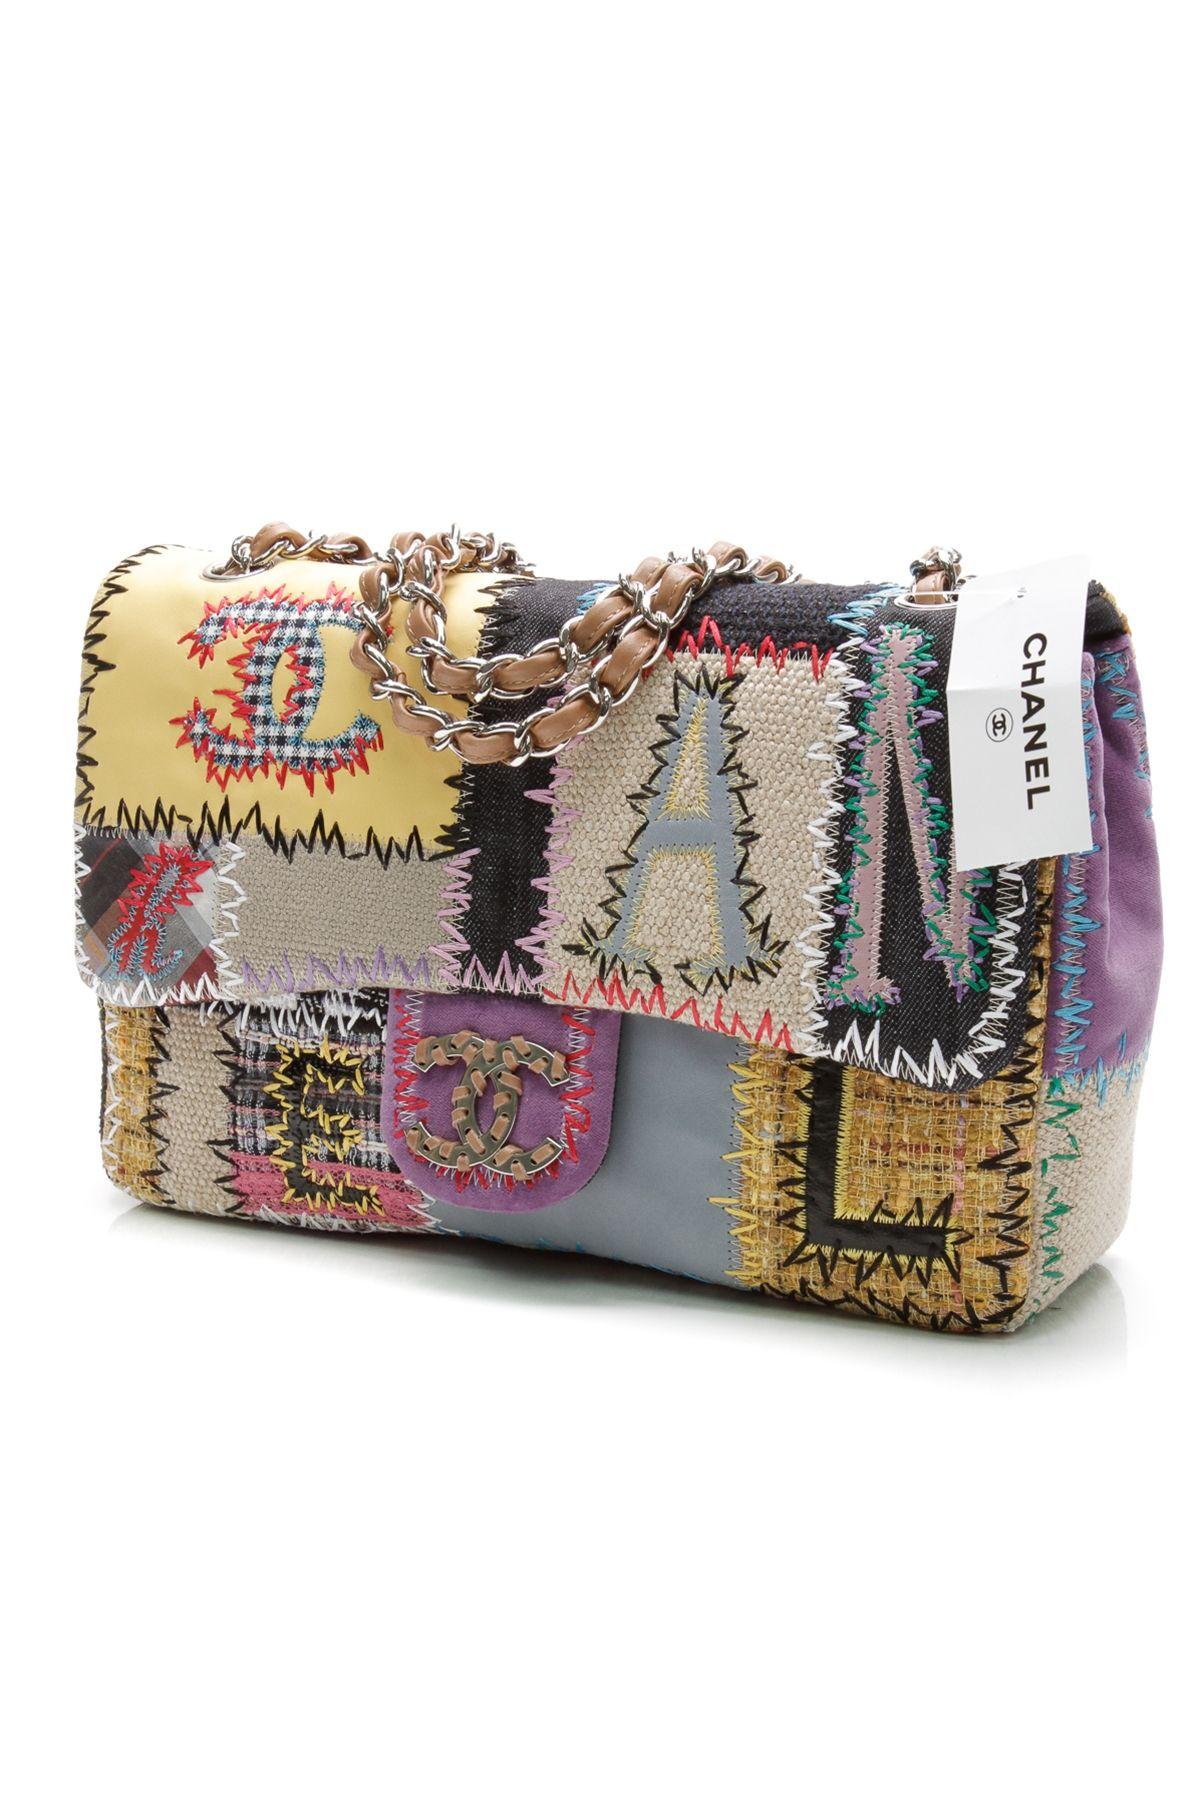 e0b31f230b86 Chanel multi colour patchwork jumbo classic flap bag. | House of ...